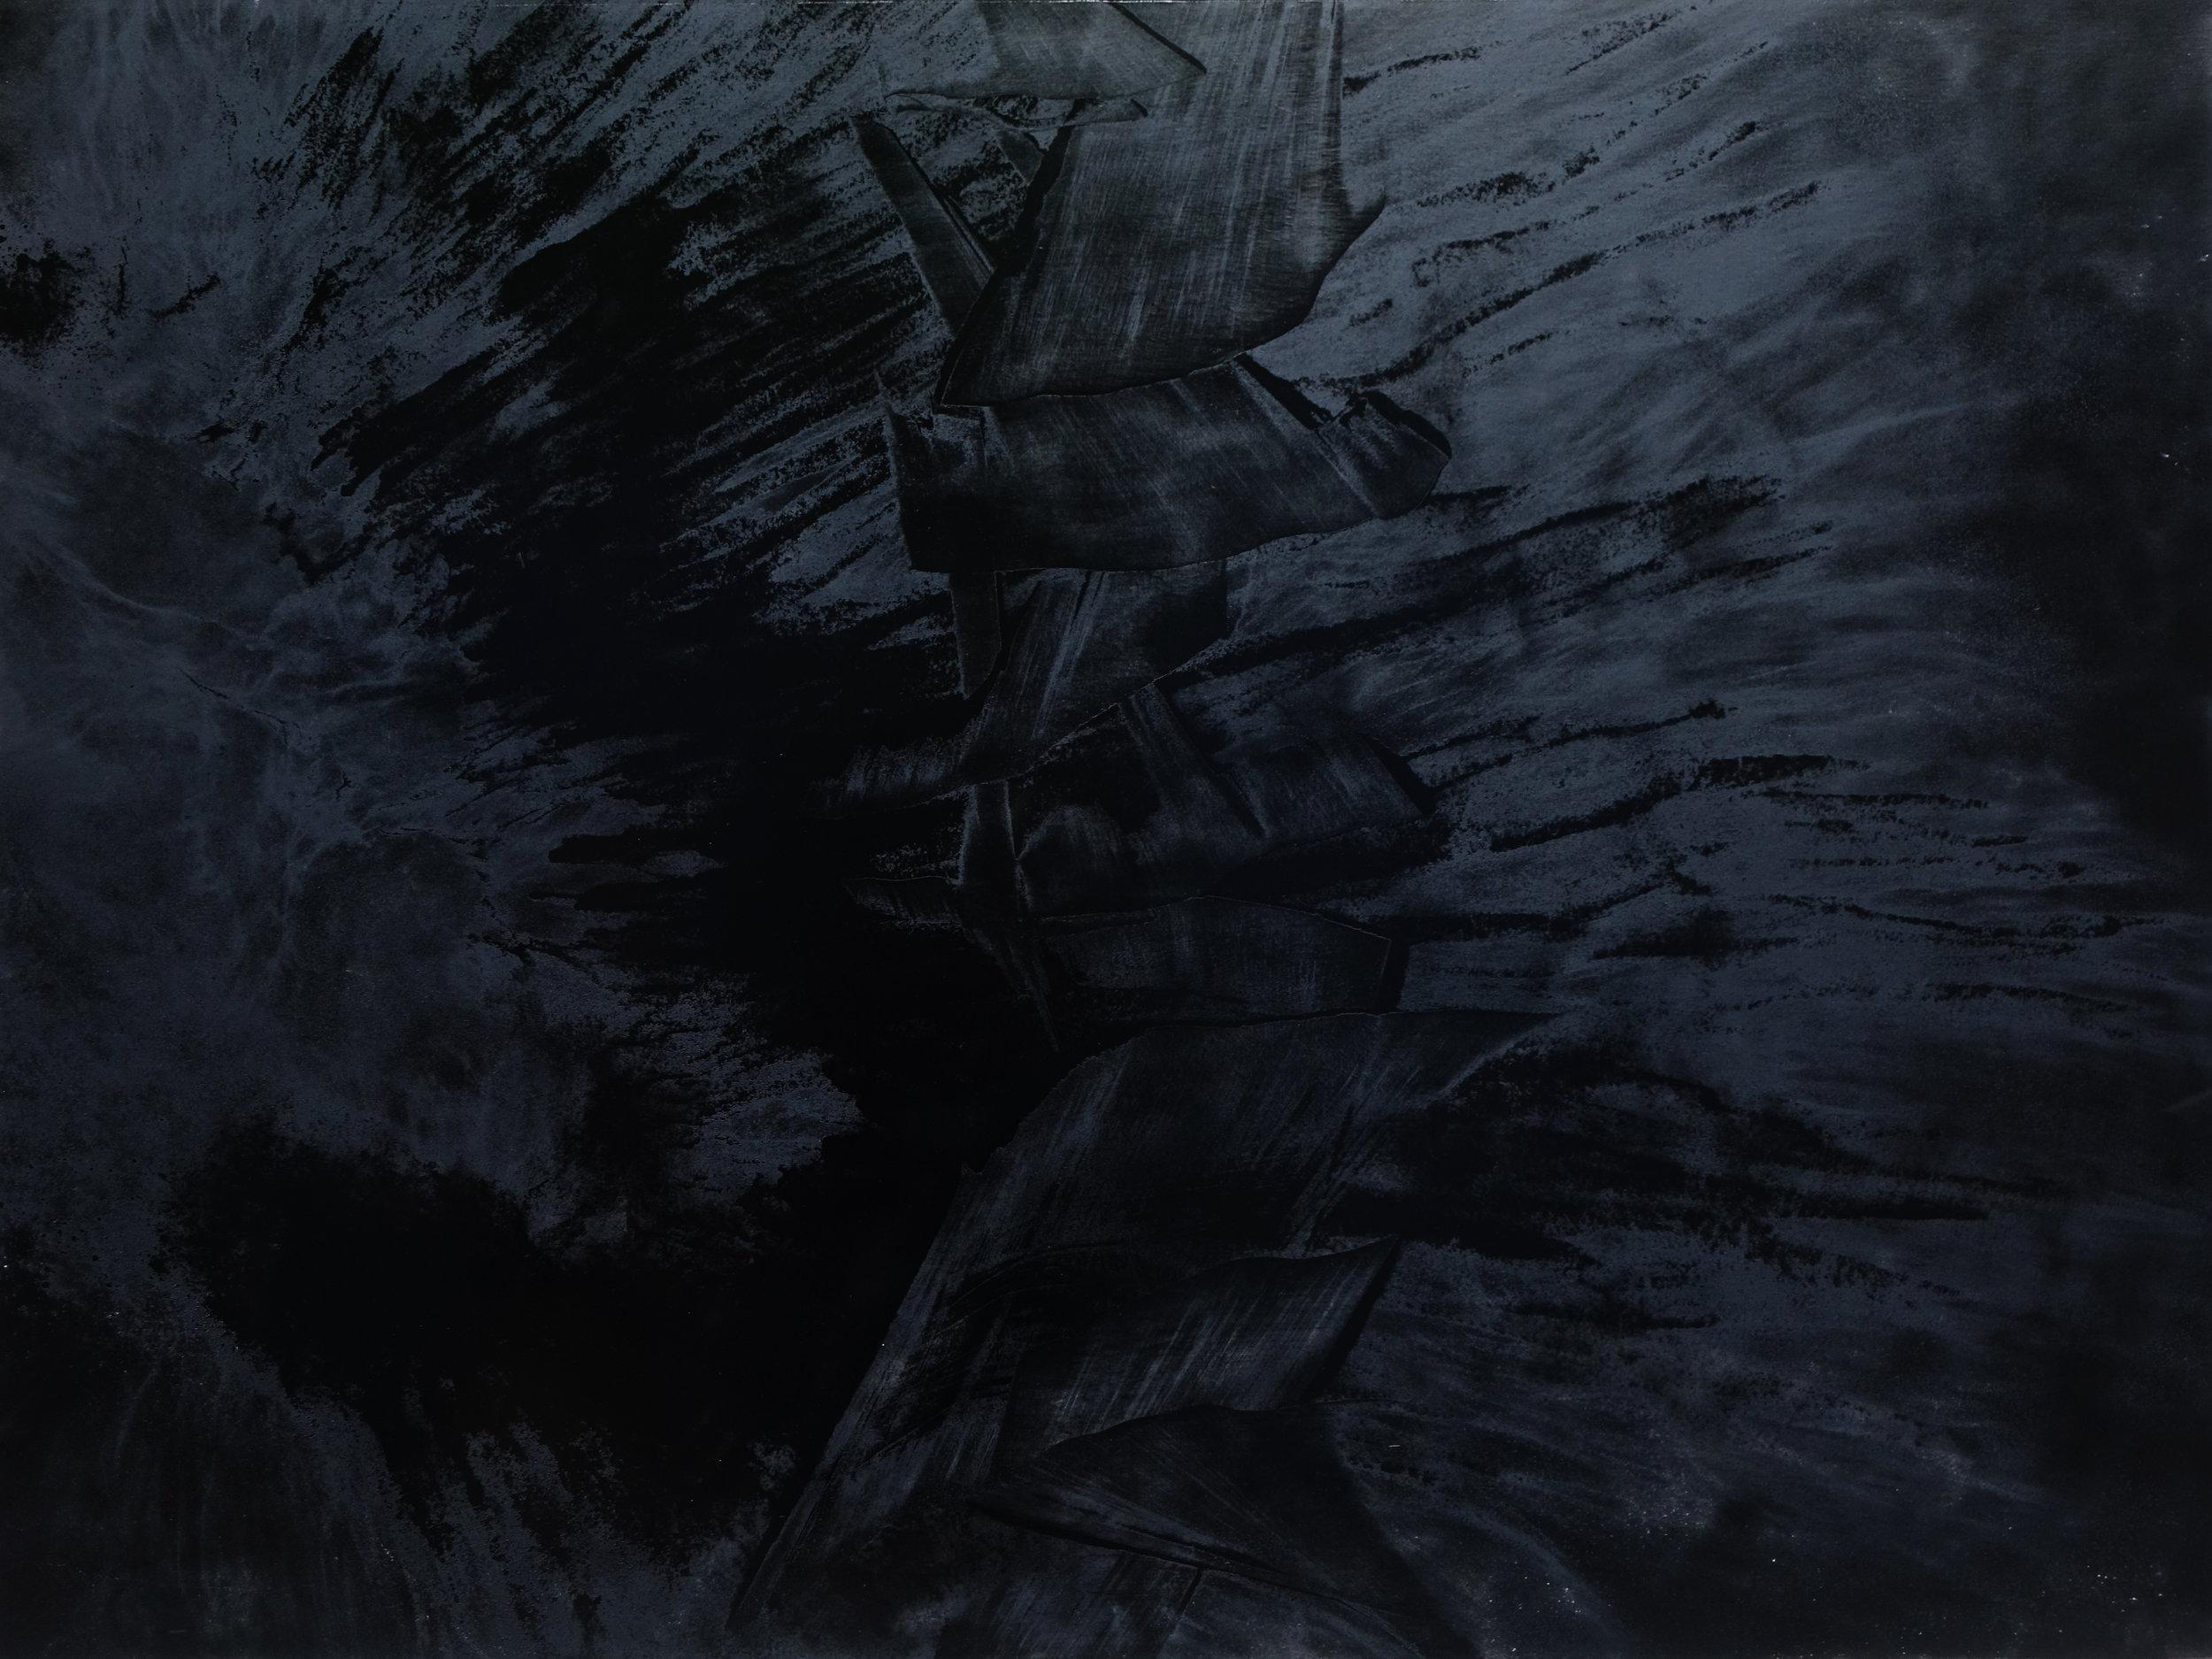 Black Void No. 16, 2017, 259cm x 194cm 200F, Oil on Canvas.jpg